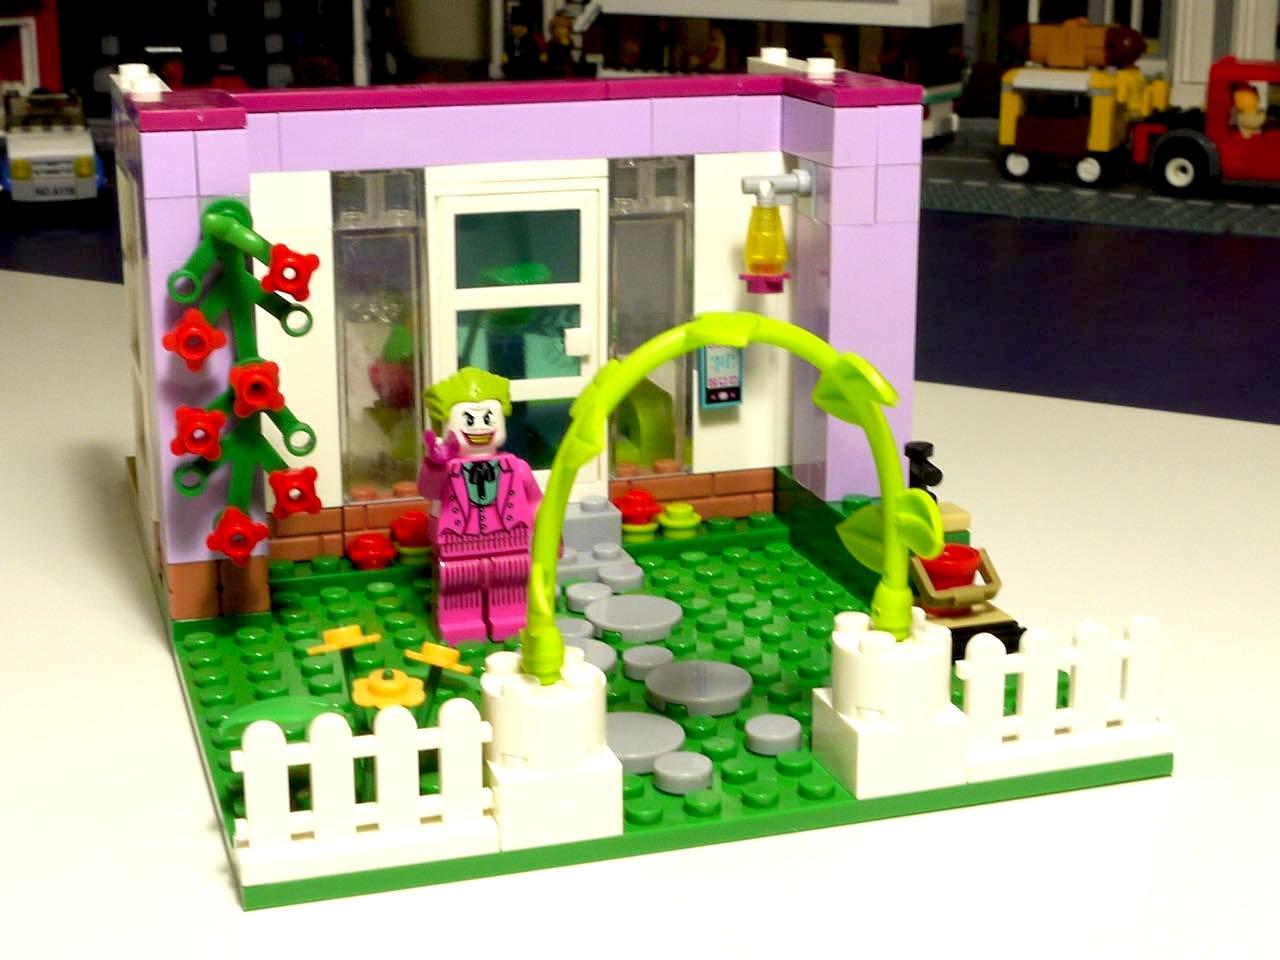 Its Not Lego Bela 10541 Emmas House Friends Building Set Review